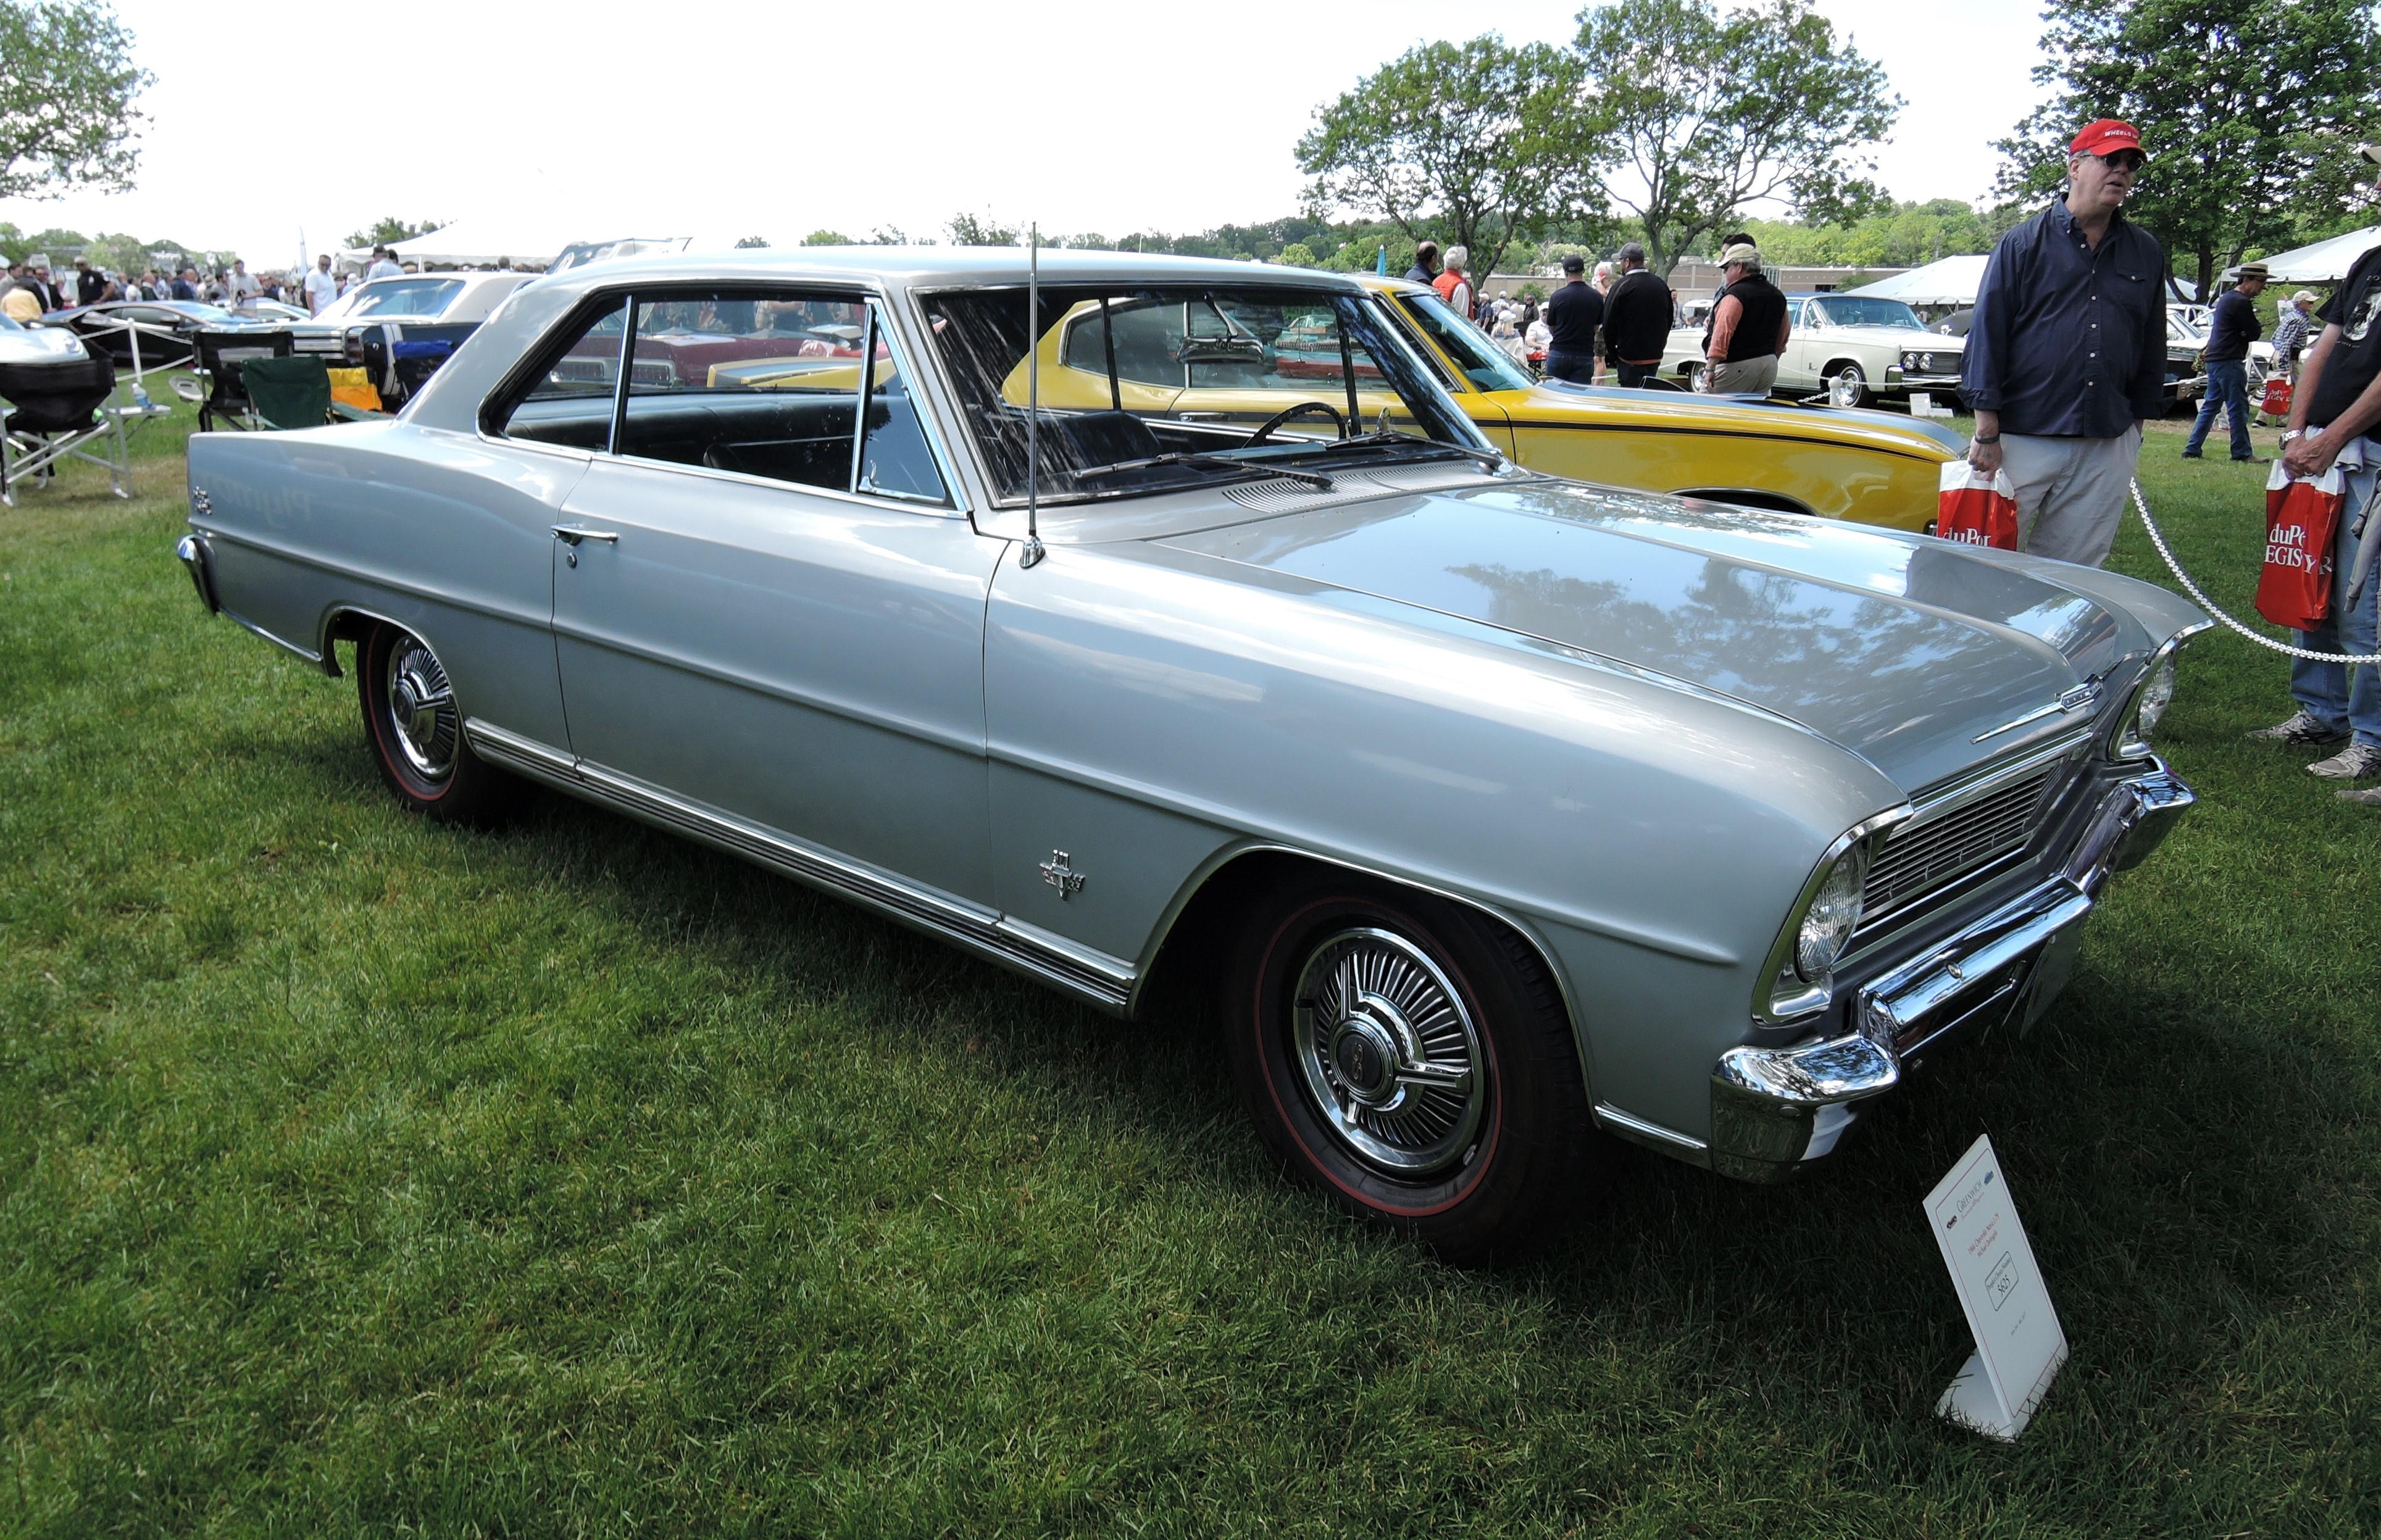 silver 1966 Chevrolet Nova L-79 - Greenwich Concours d'Elegance 2017